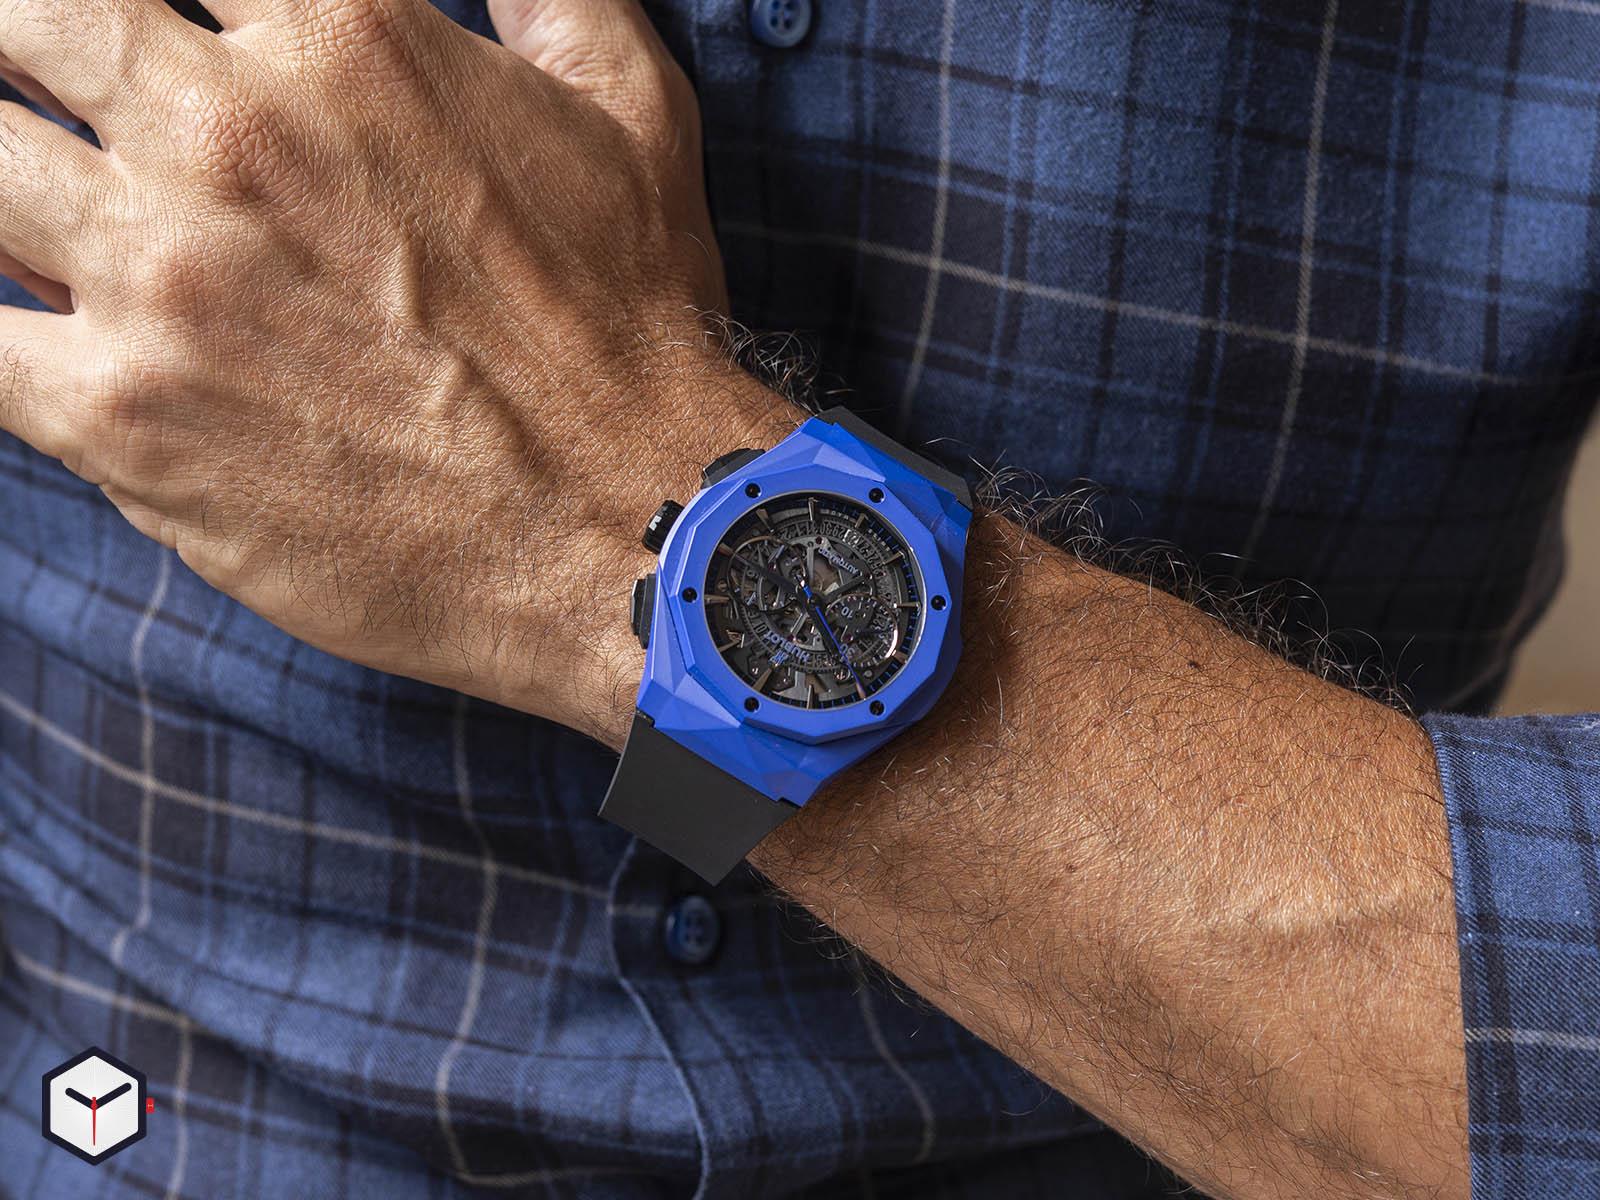 525-ex-0179-rx-orl18-hublot-aerofusion-chronograph-orlinski-blue-ceramic-9.jpg